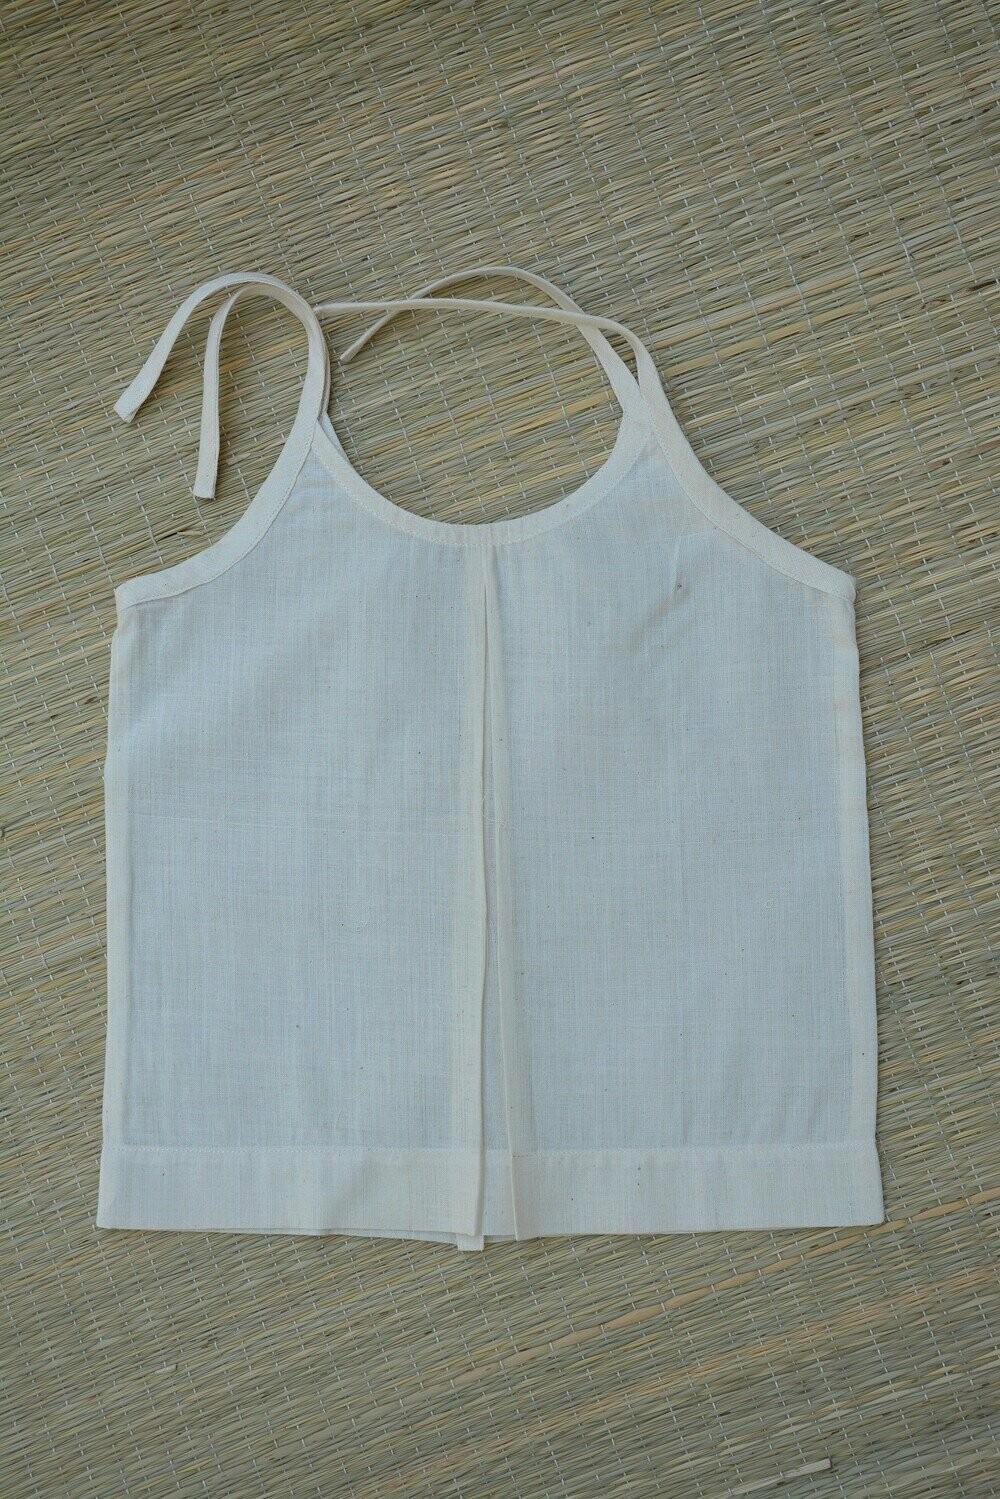 Ambara Charaka spun and Handwoven cotton muslin Jhabla for Infants (0 - 3 months) - Set of 5 .